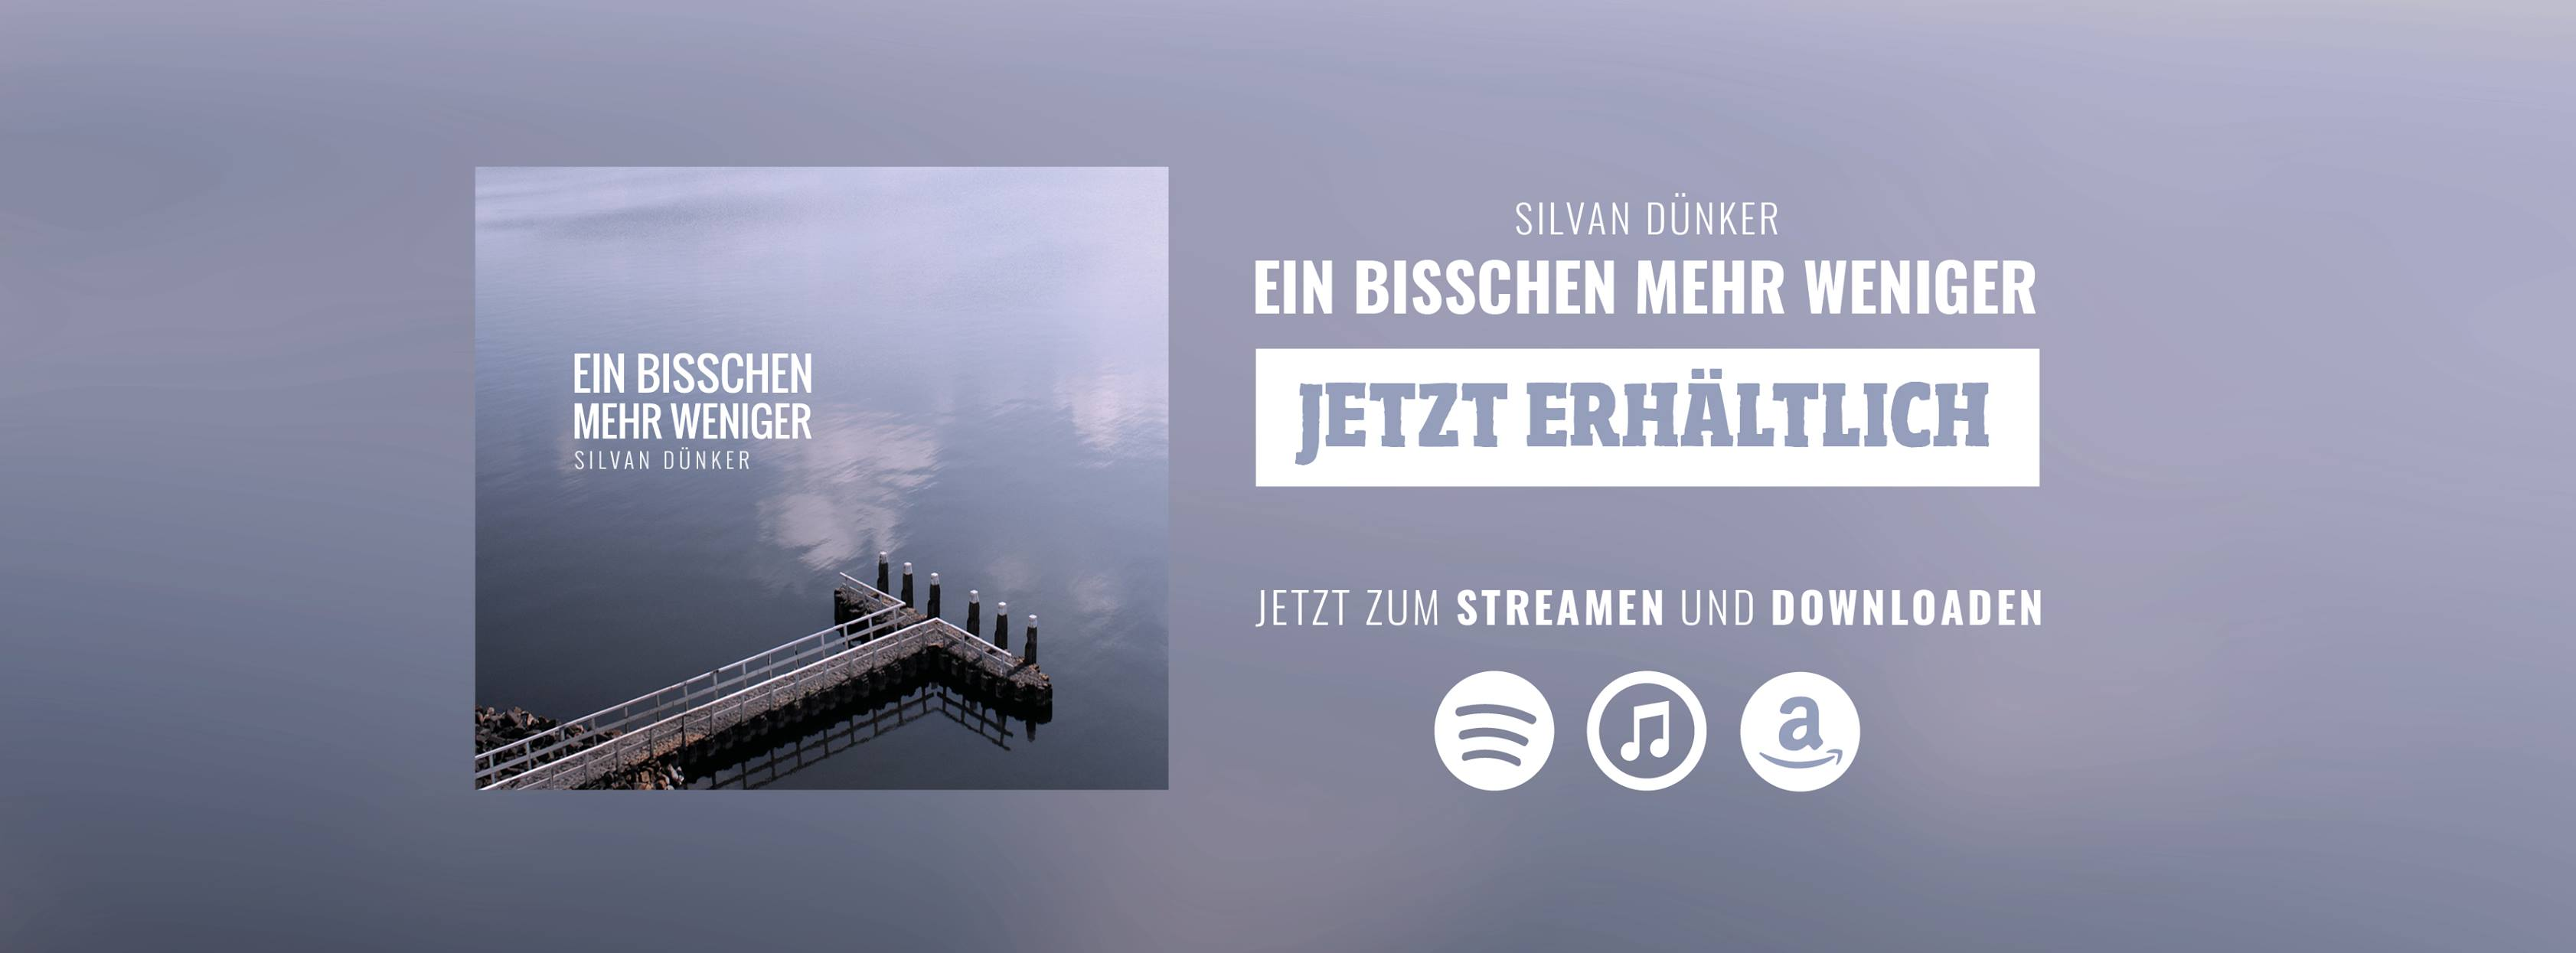 Silvan Dünker Album